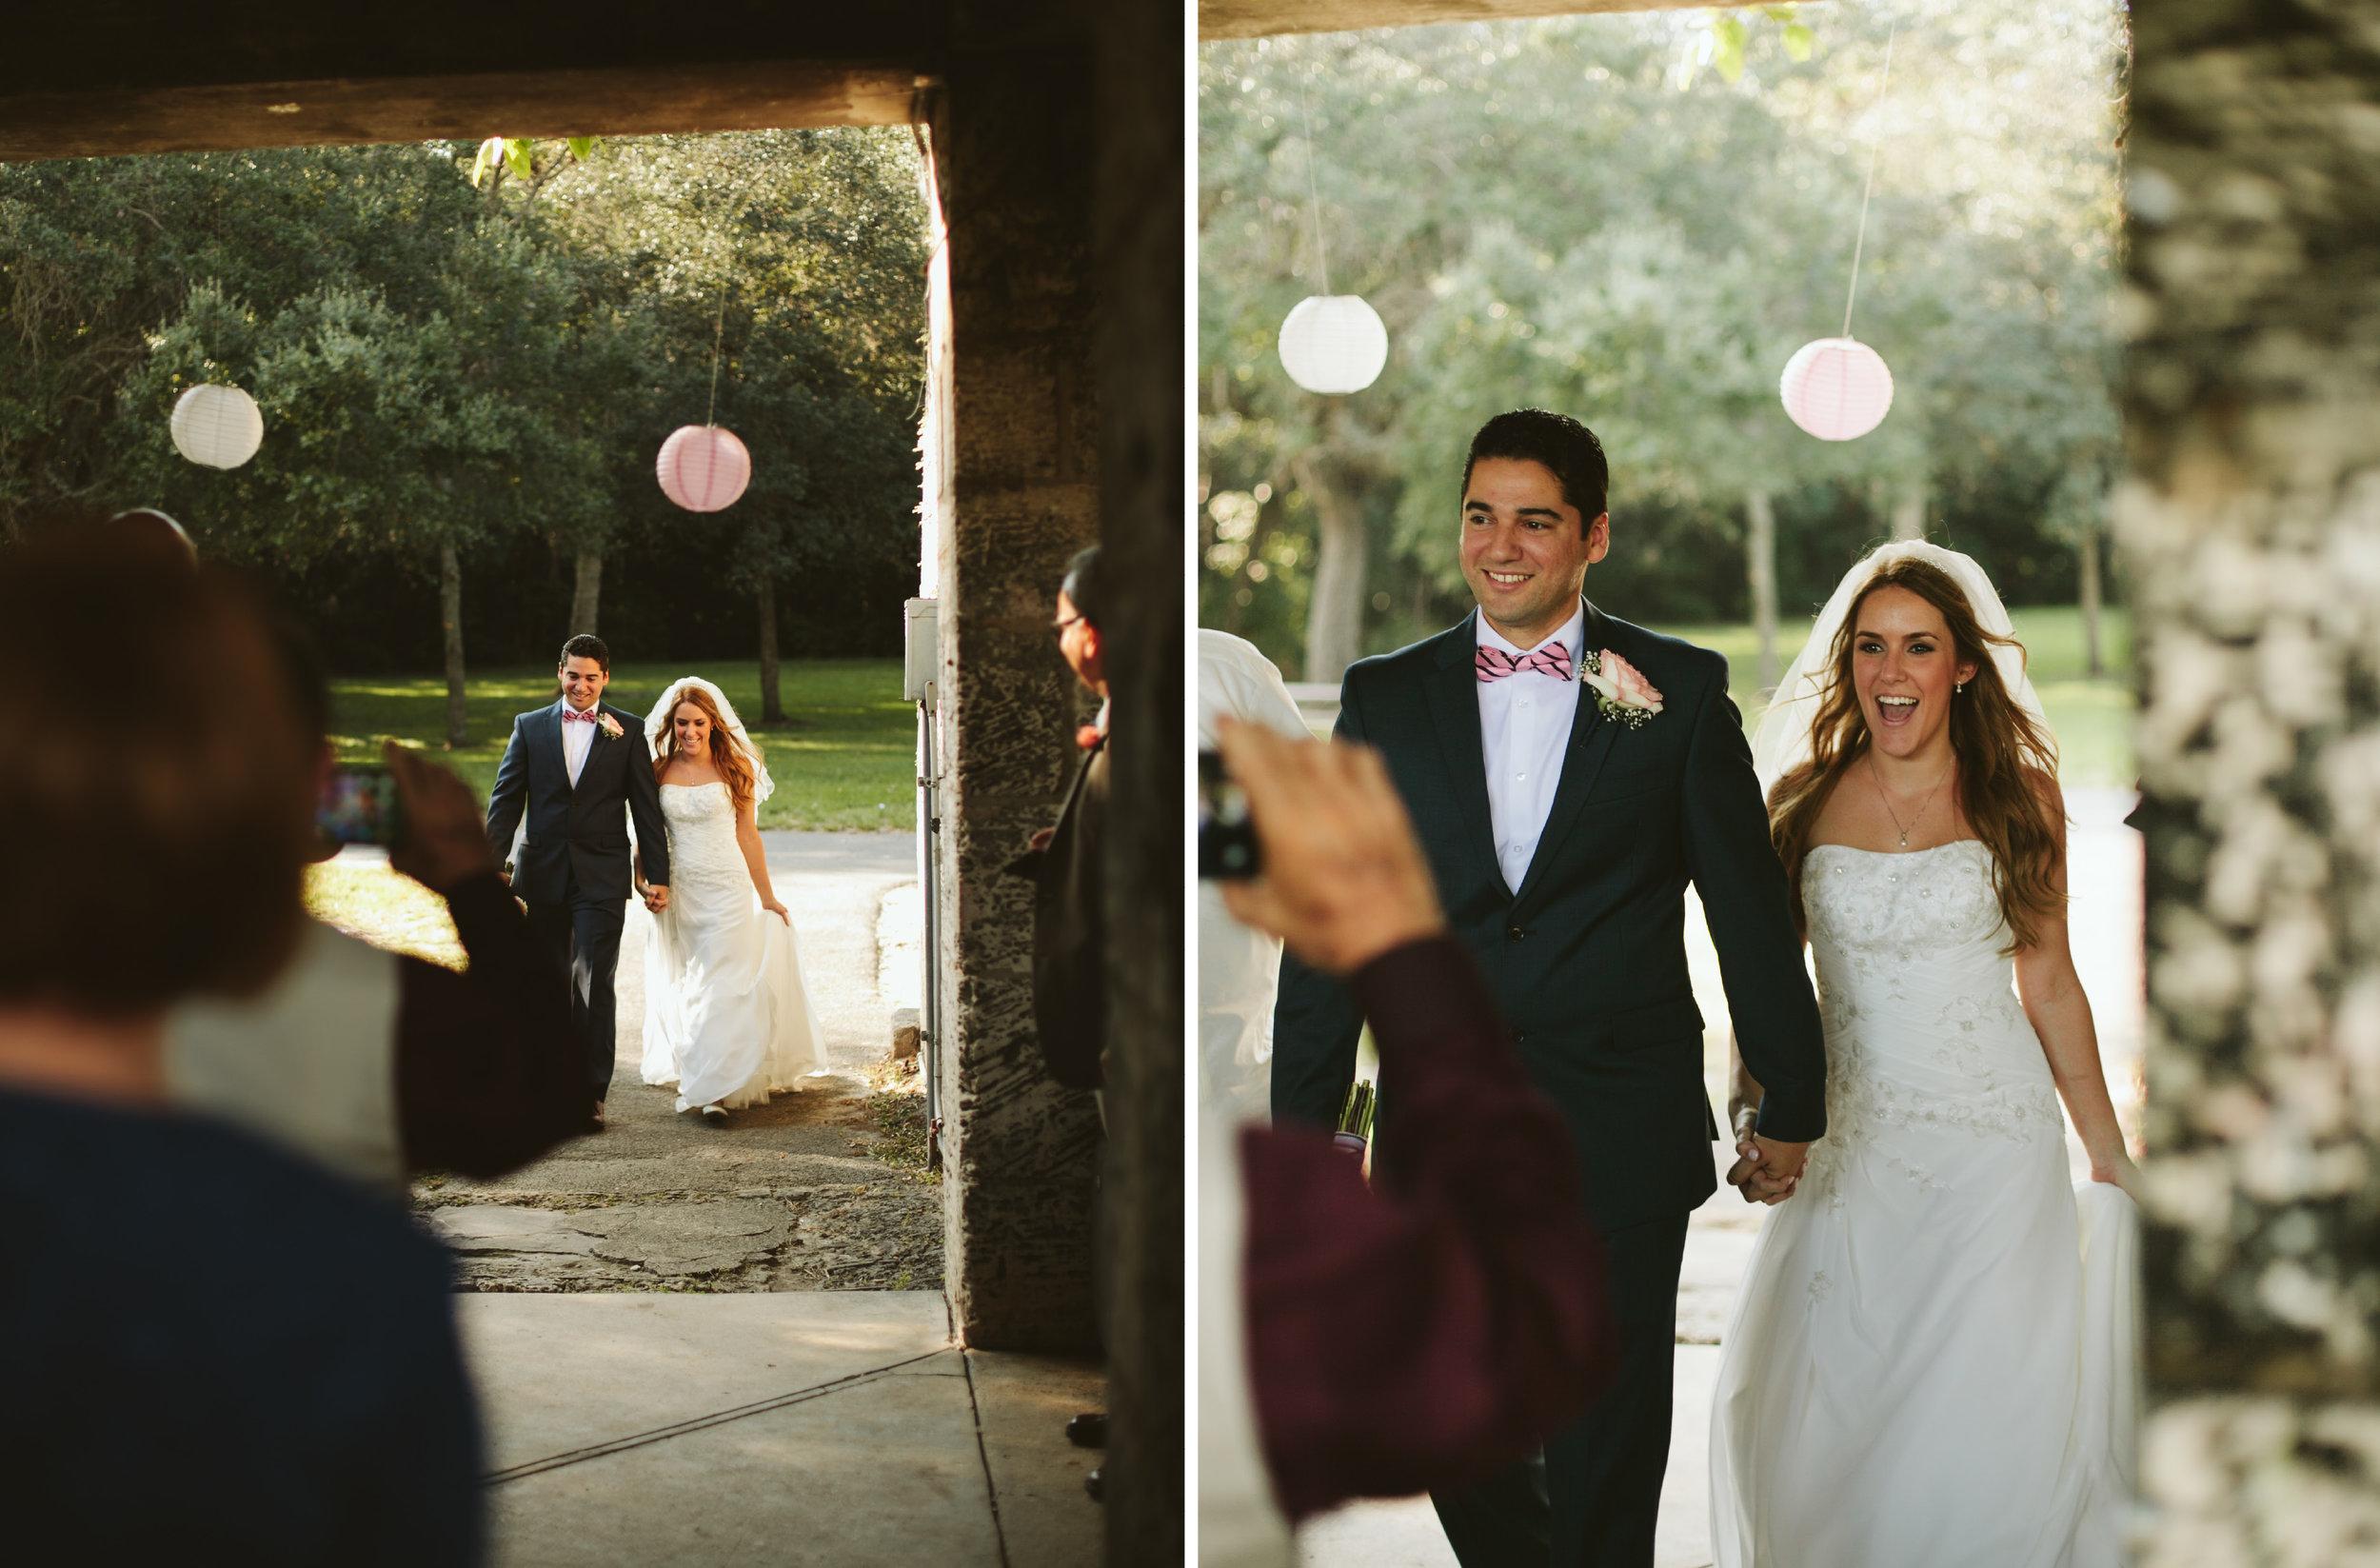 Karen + Lester Matheson Hammock Park Wedding33.jpg